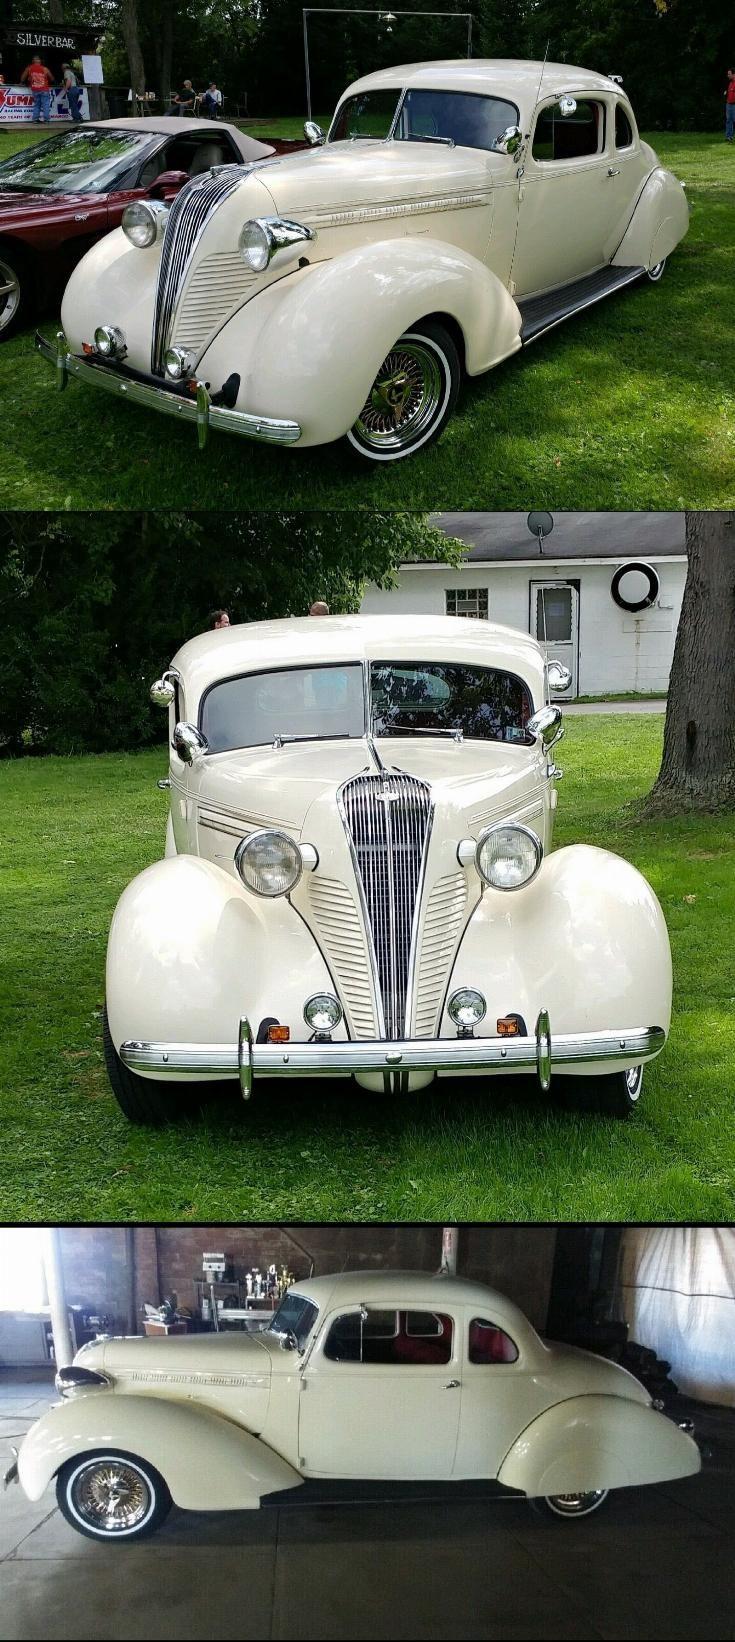 1937 Hudson Terraplane Utility Coupe Hudson Terraplane Collector Cars For Sale Antique Cars